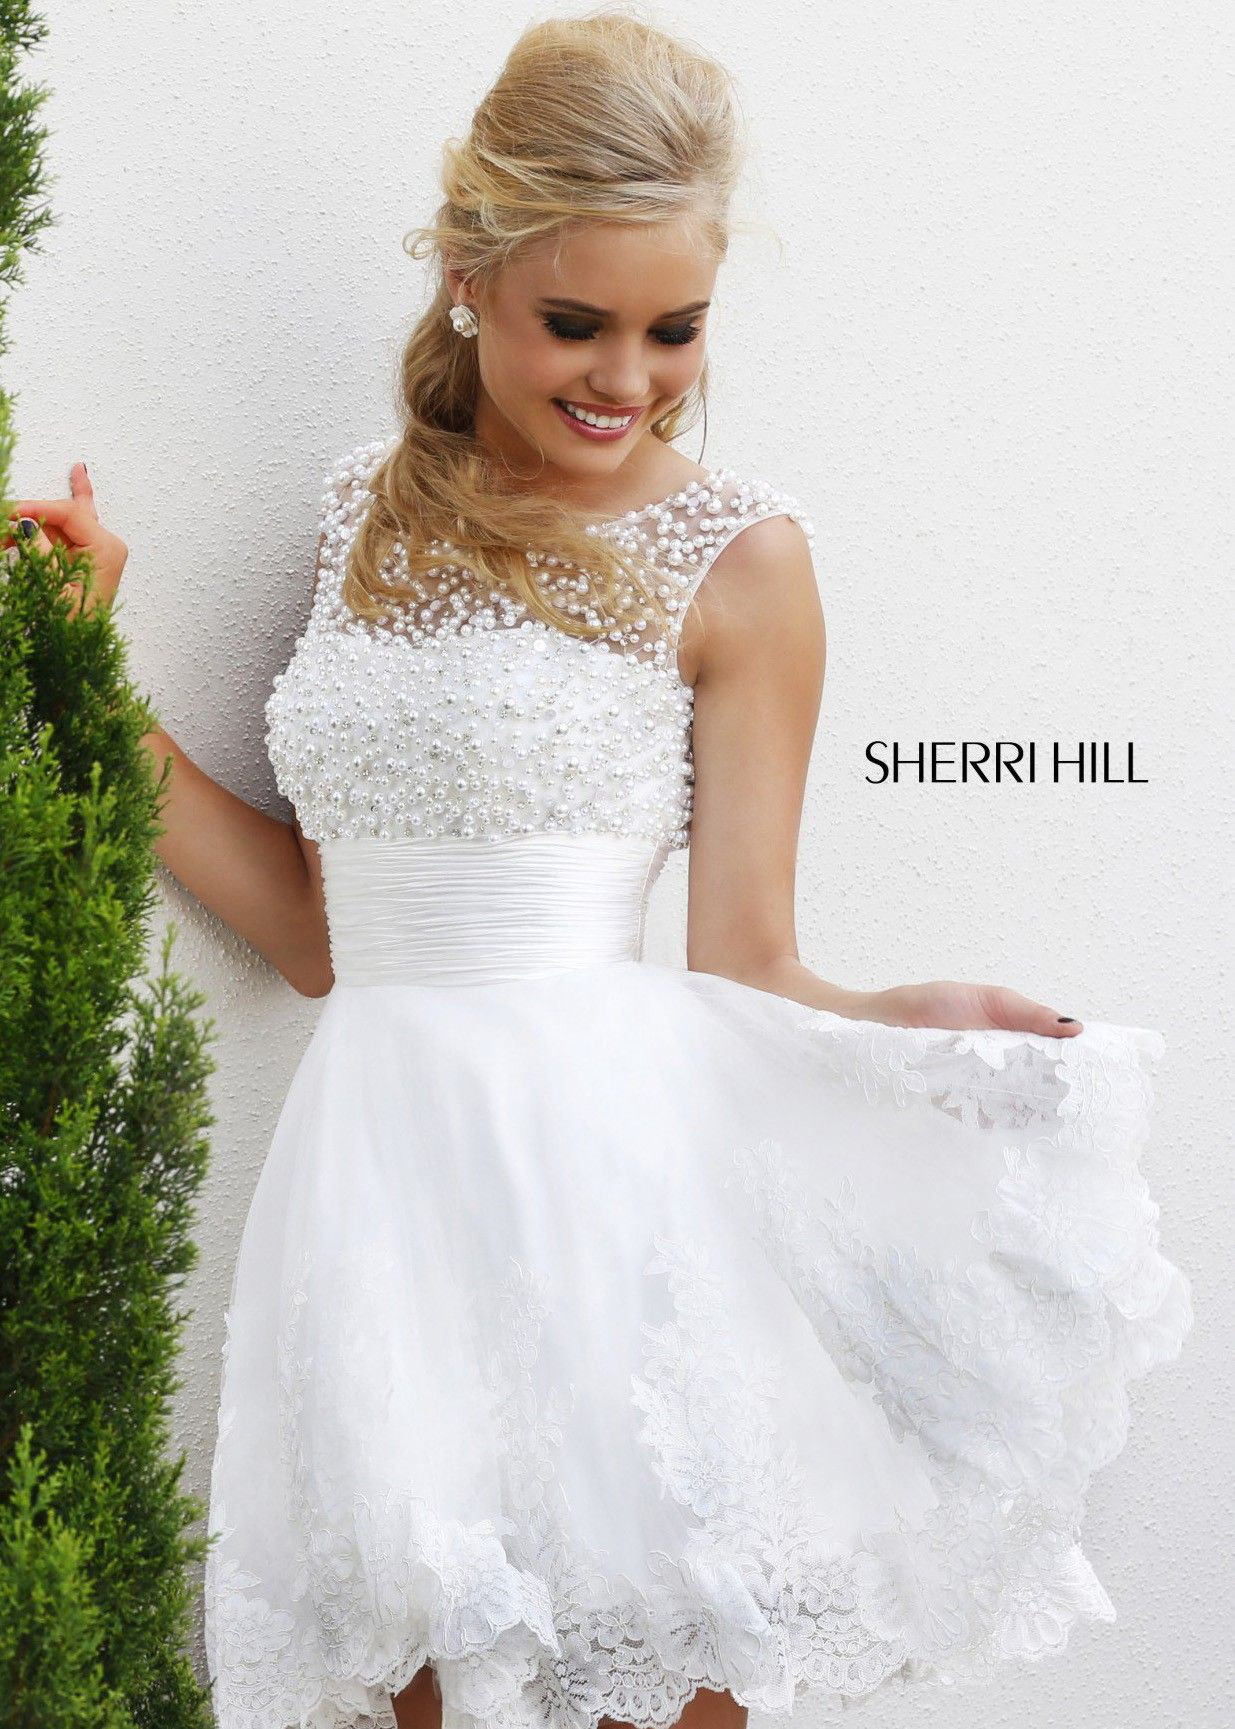 Sherri hill lace wedding dress  Sherri Hill  White Beaded Party Dress  Reception Dress  White